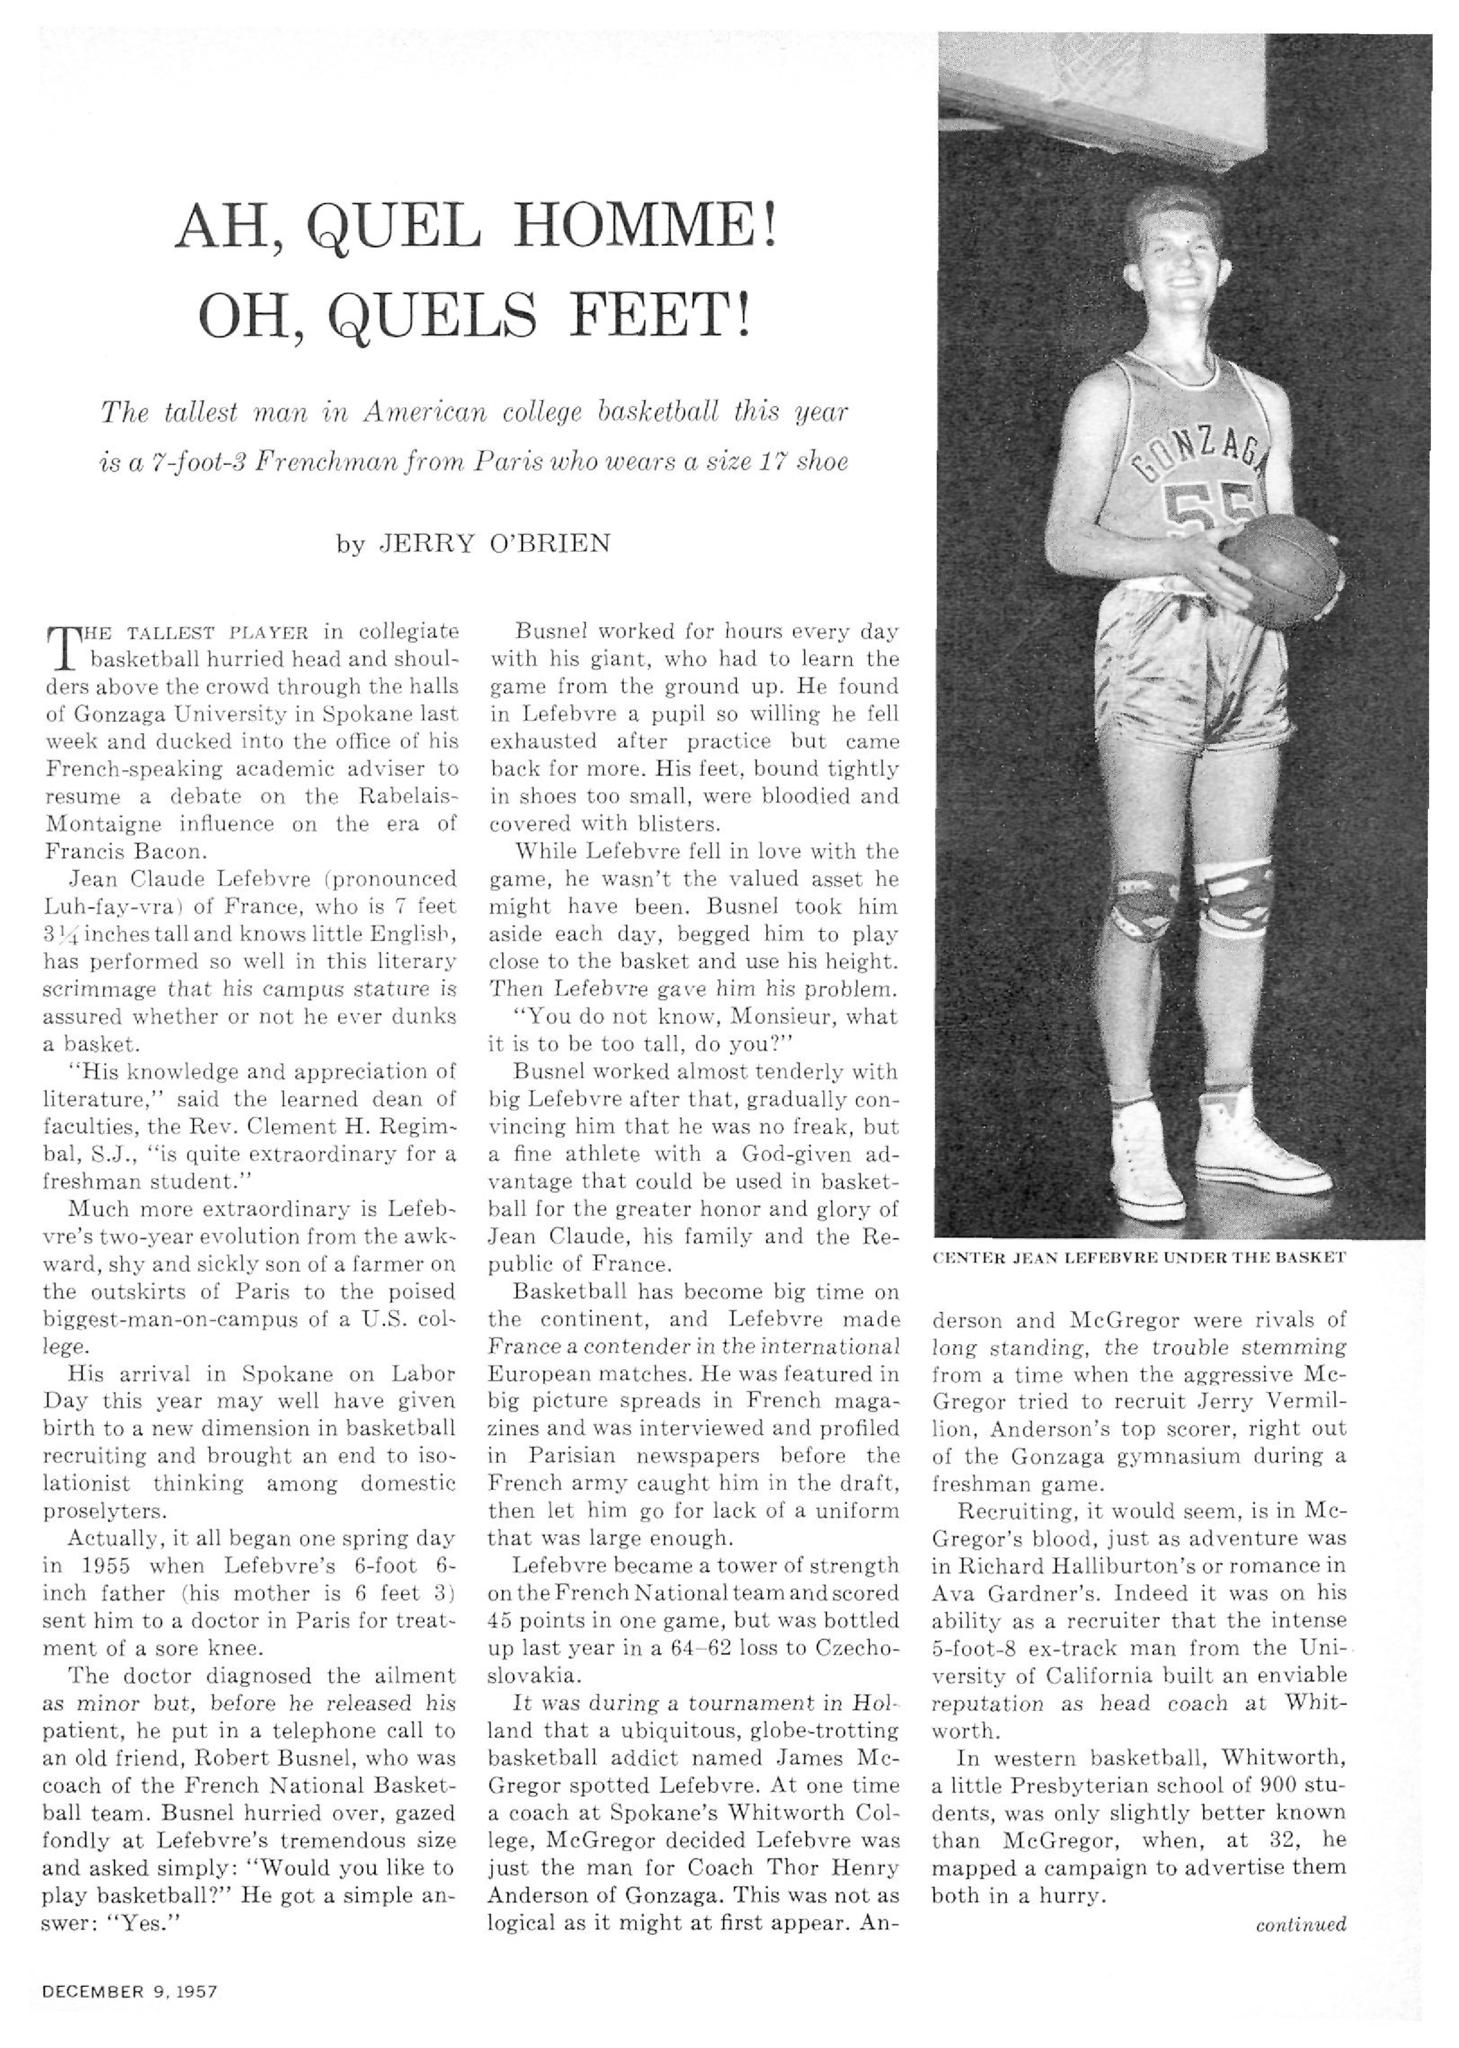 Sports_Illustrated_42782_19571209-101-2048.jpg